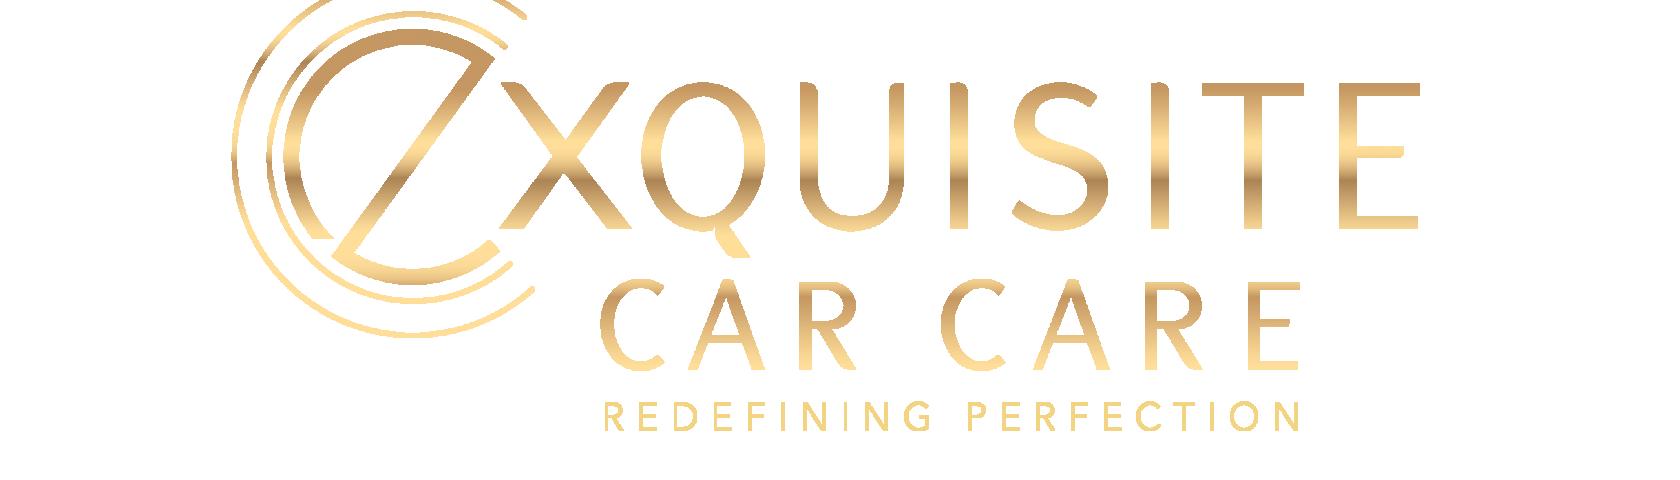 Exquisite Cc Secondary Logo